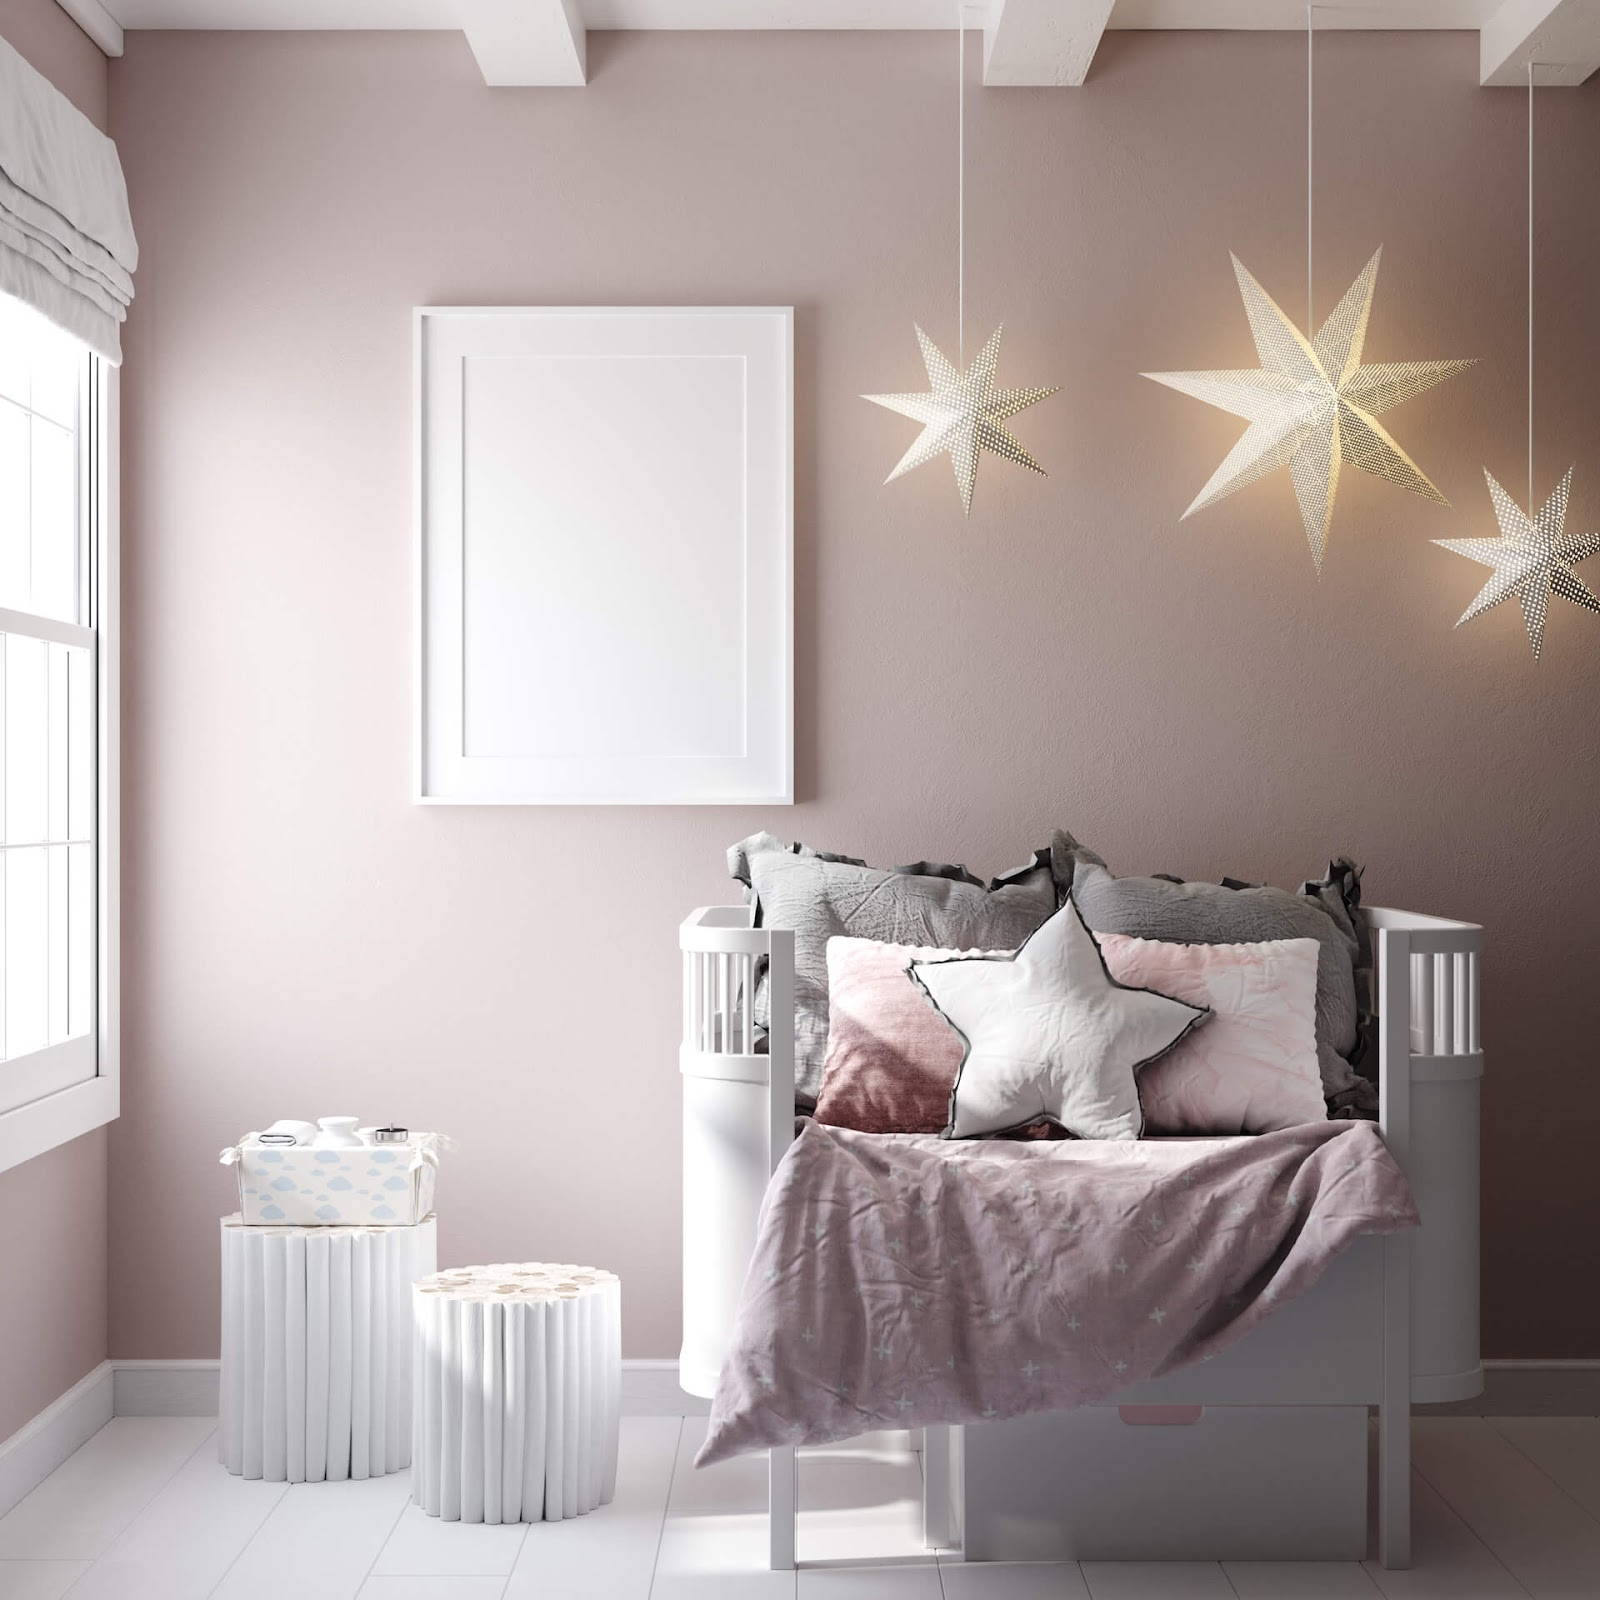 Room panted pink